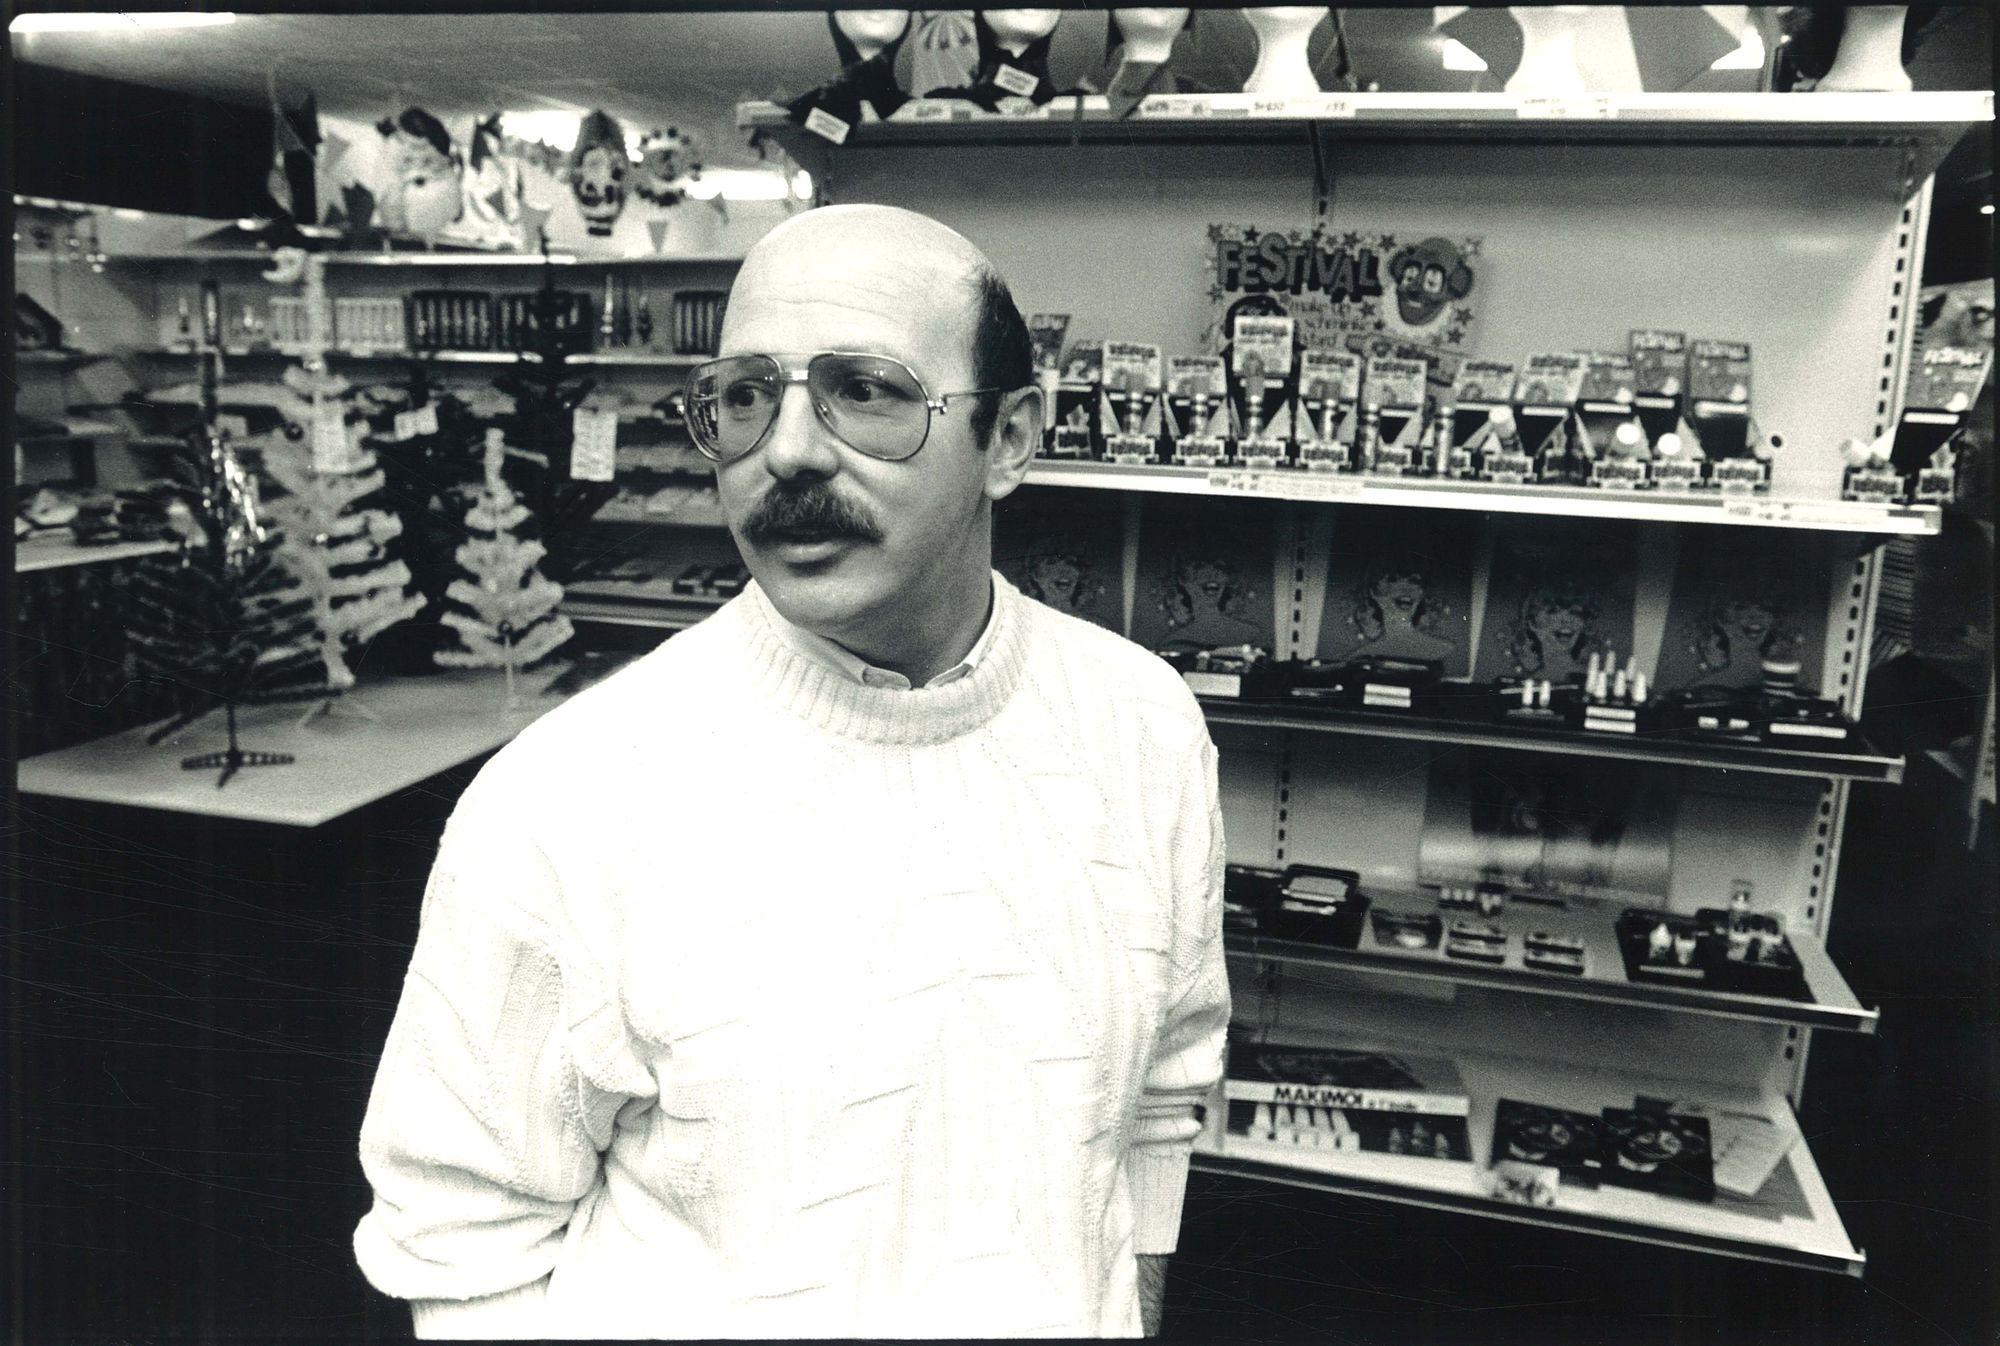 FARAM, de farcewinkel uit Wevelgem 1988